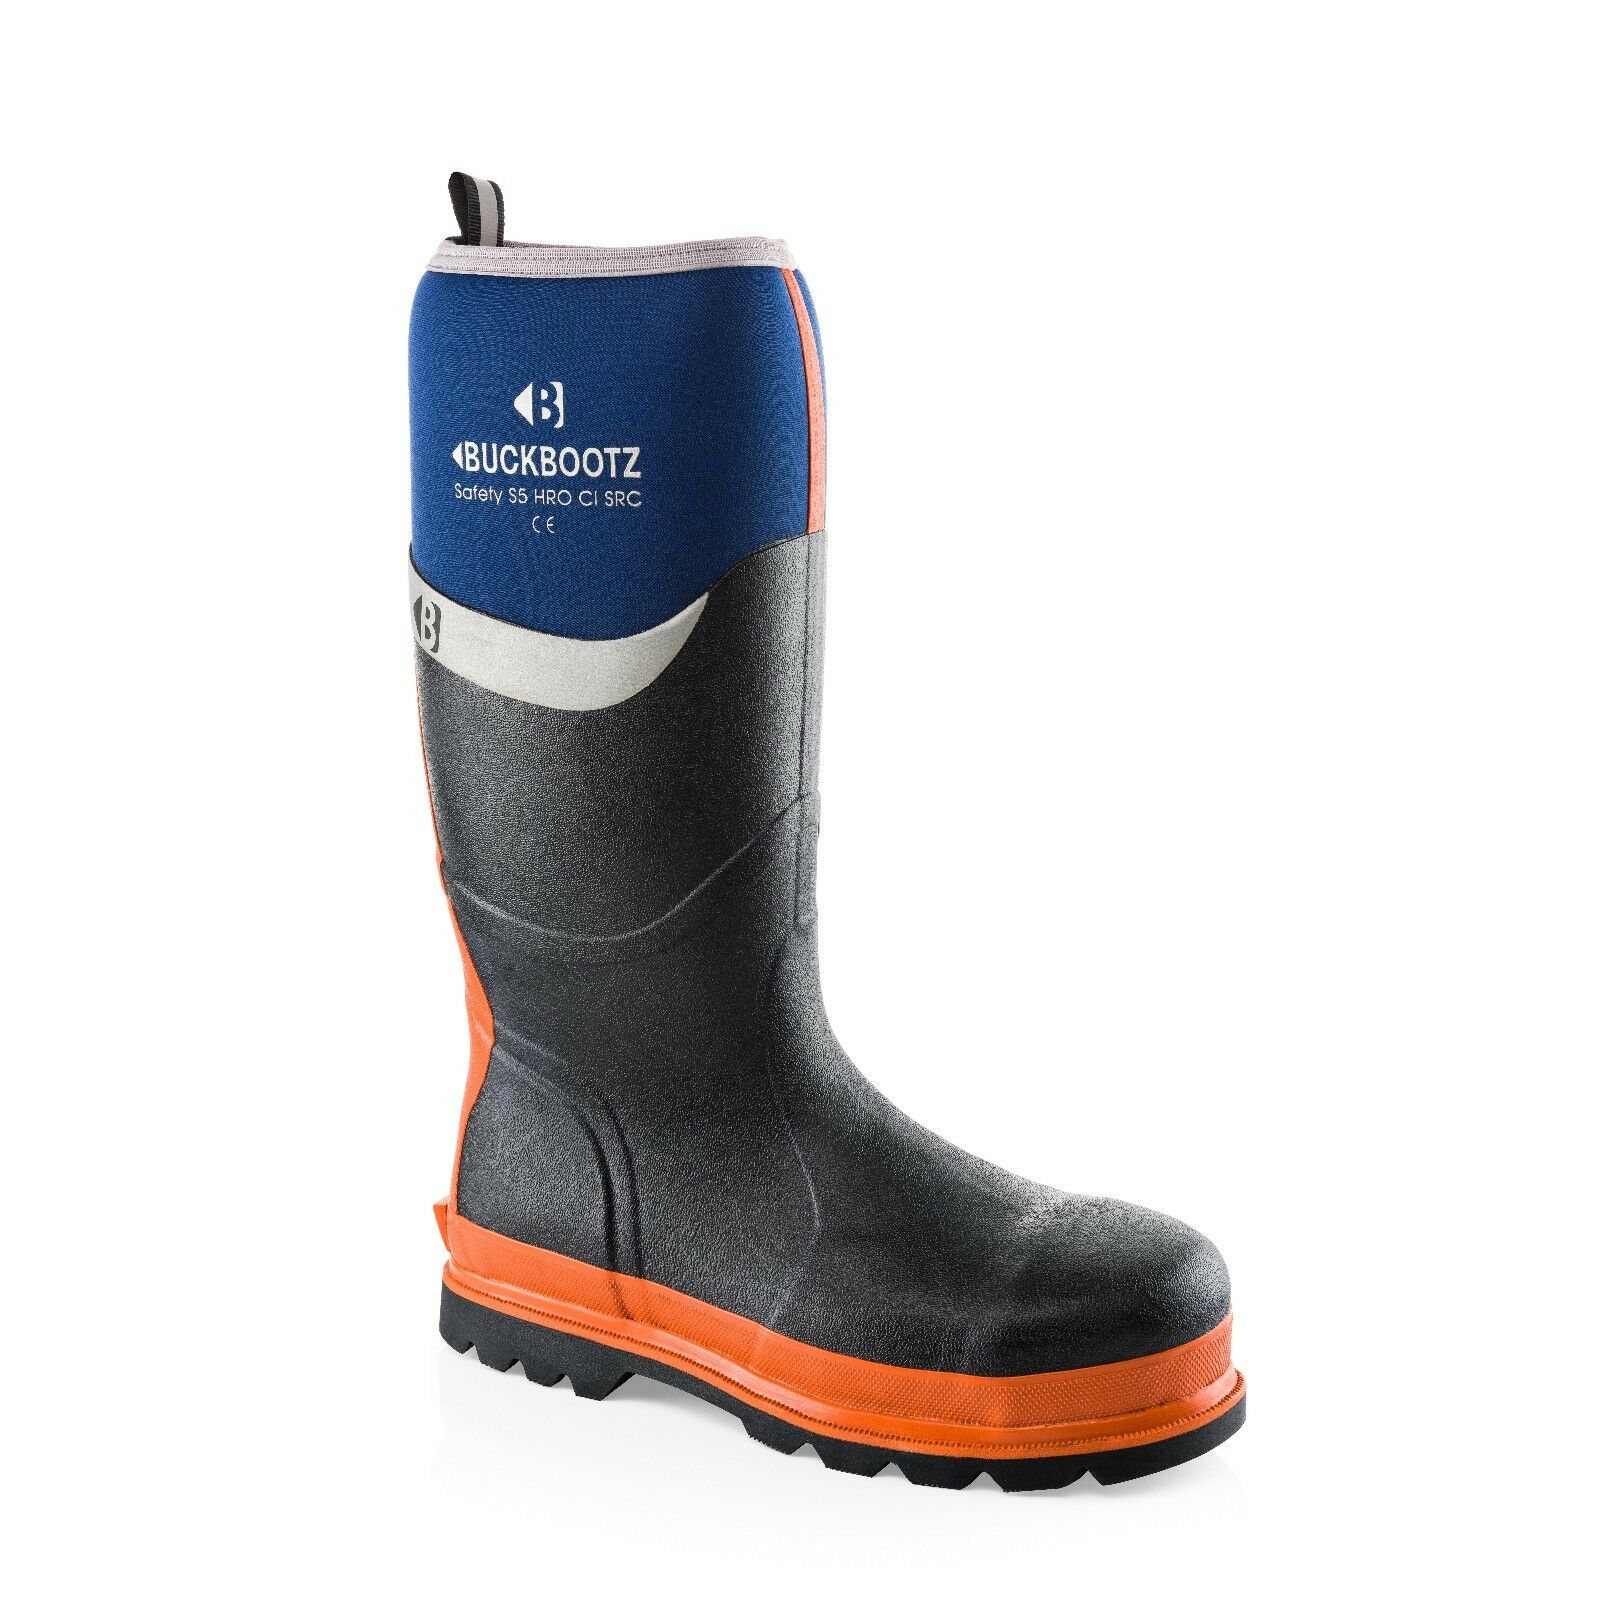 Buckler BBZ6000BL Waterproof (Talla Rubber Safety Wellington botas (Talla Waterproof 5-13) Hombres 25f169